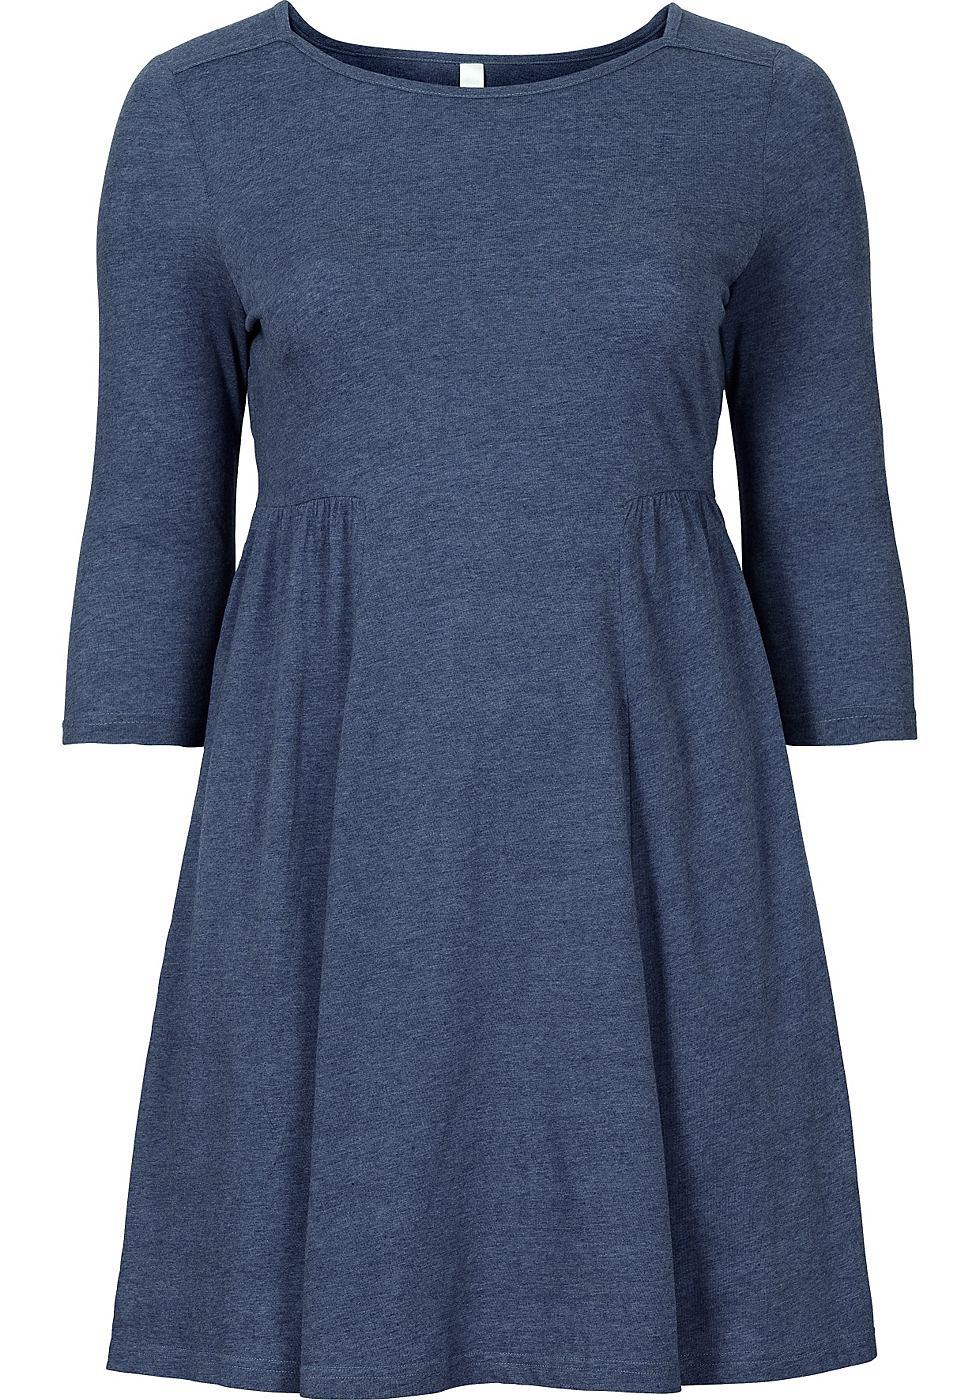 Sheego Casual jerseyjurk met driekwartmouwen blauw